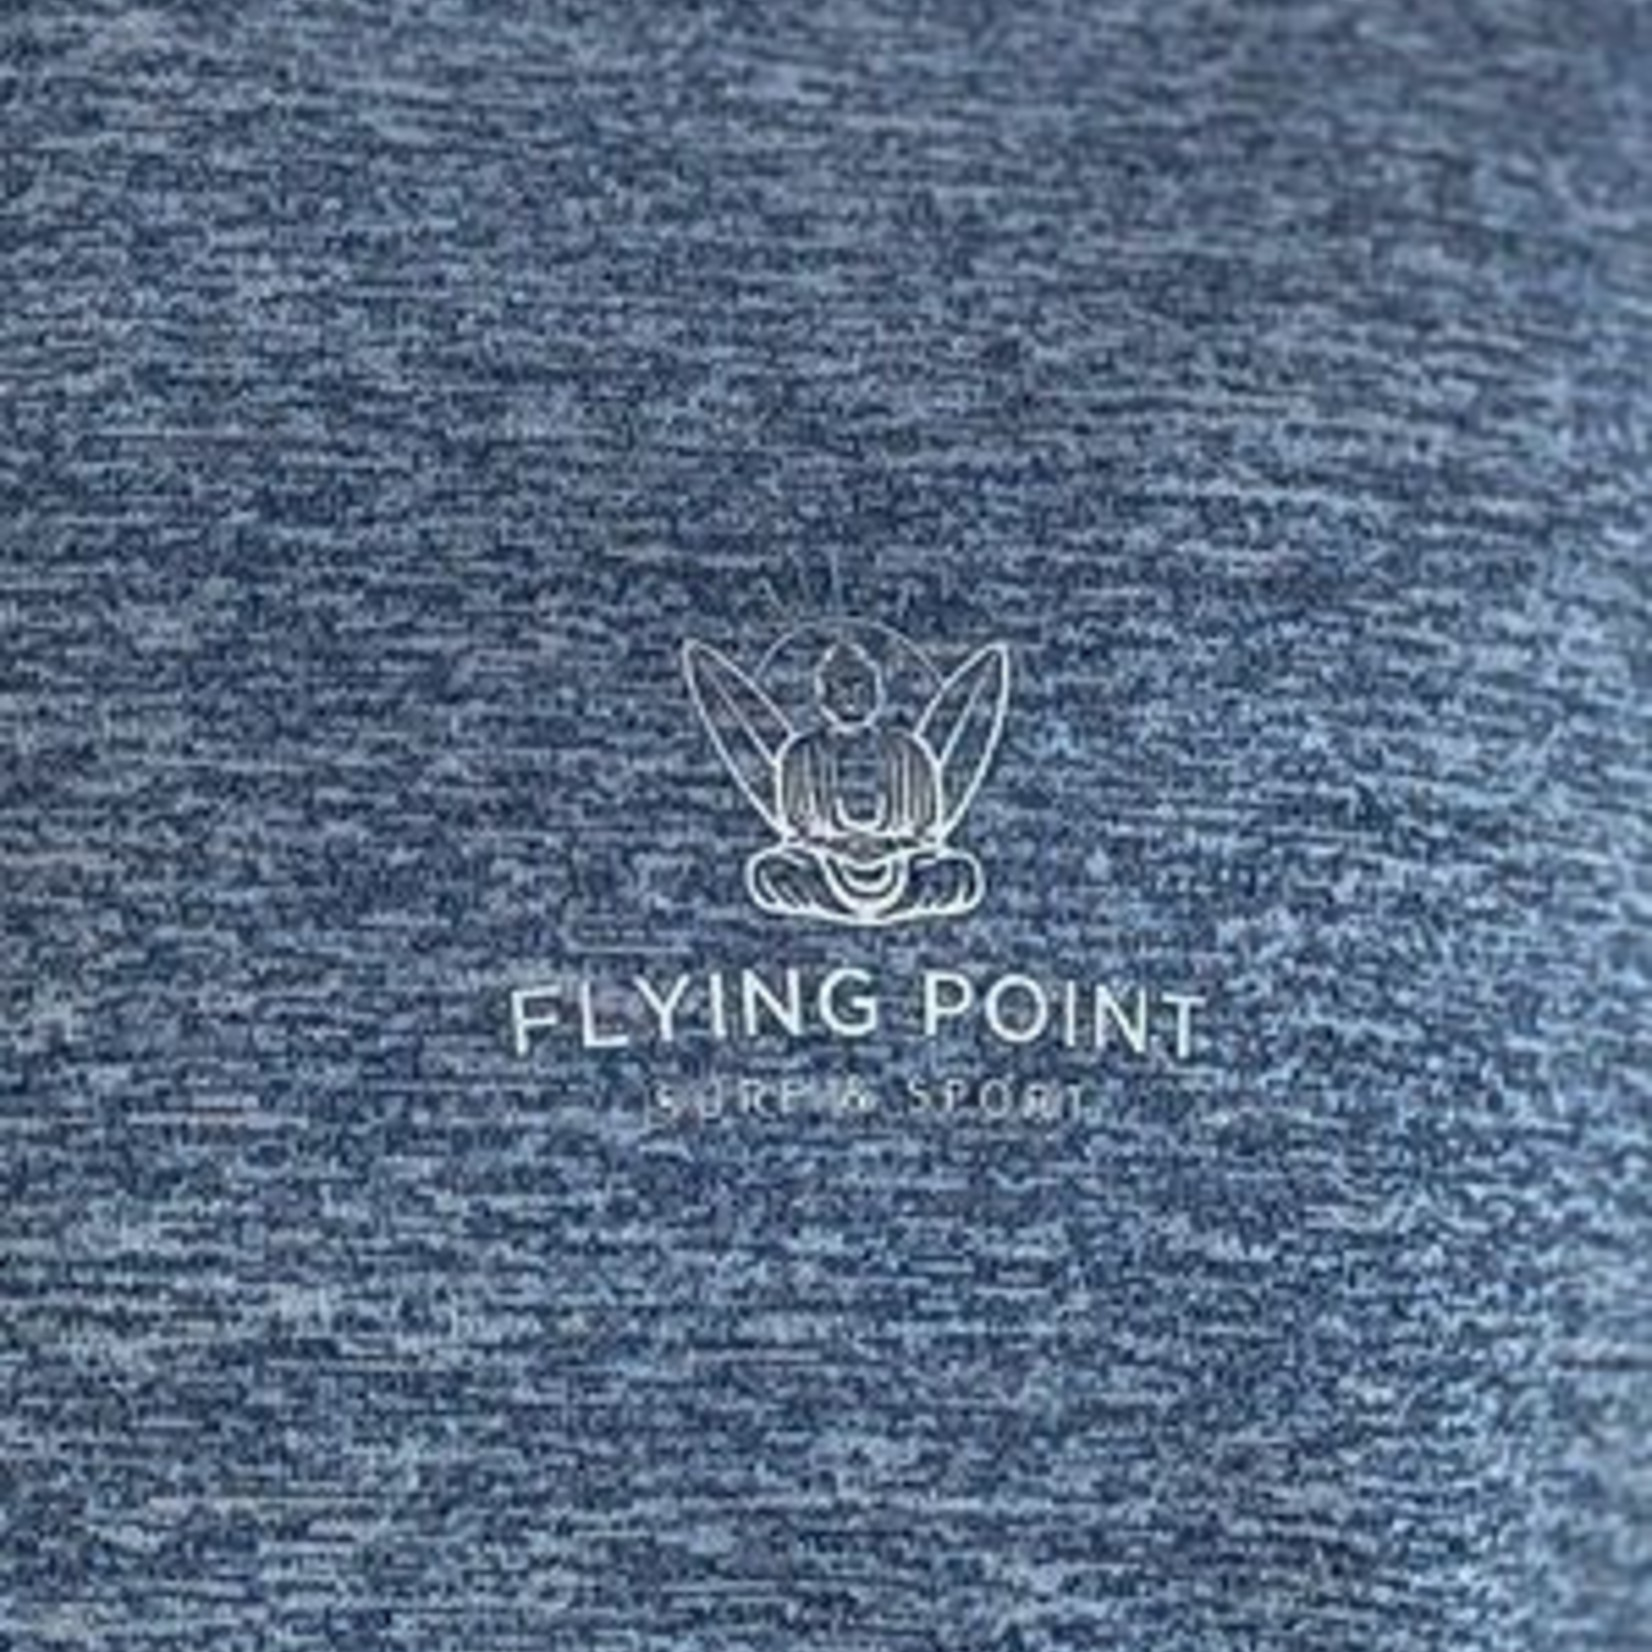 Flying Point Performance L/S Rashguard